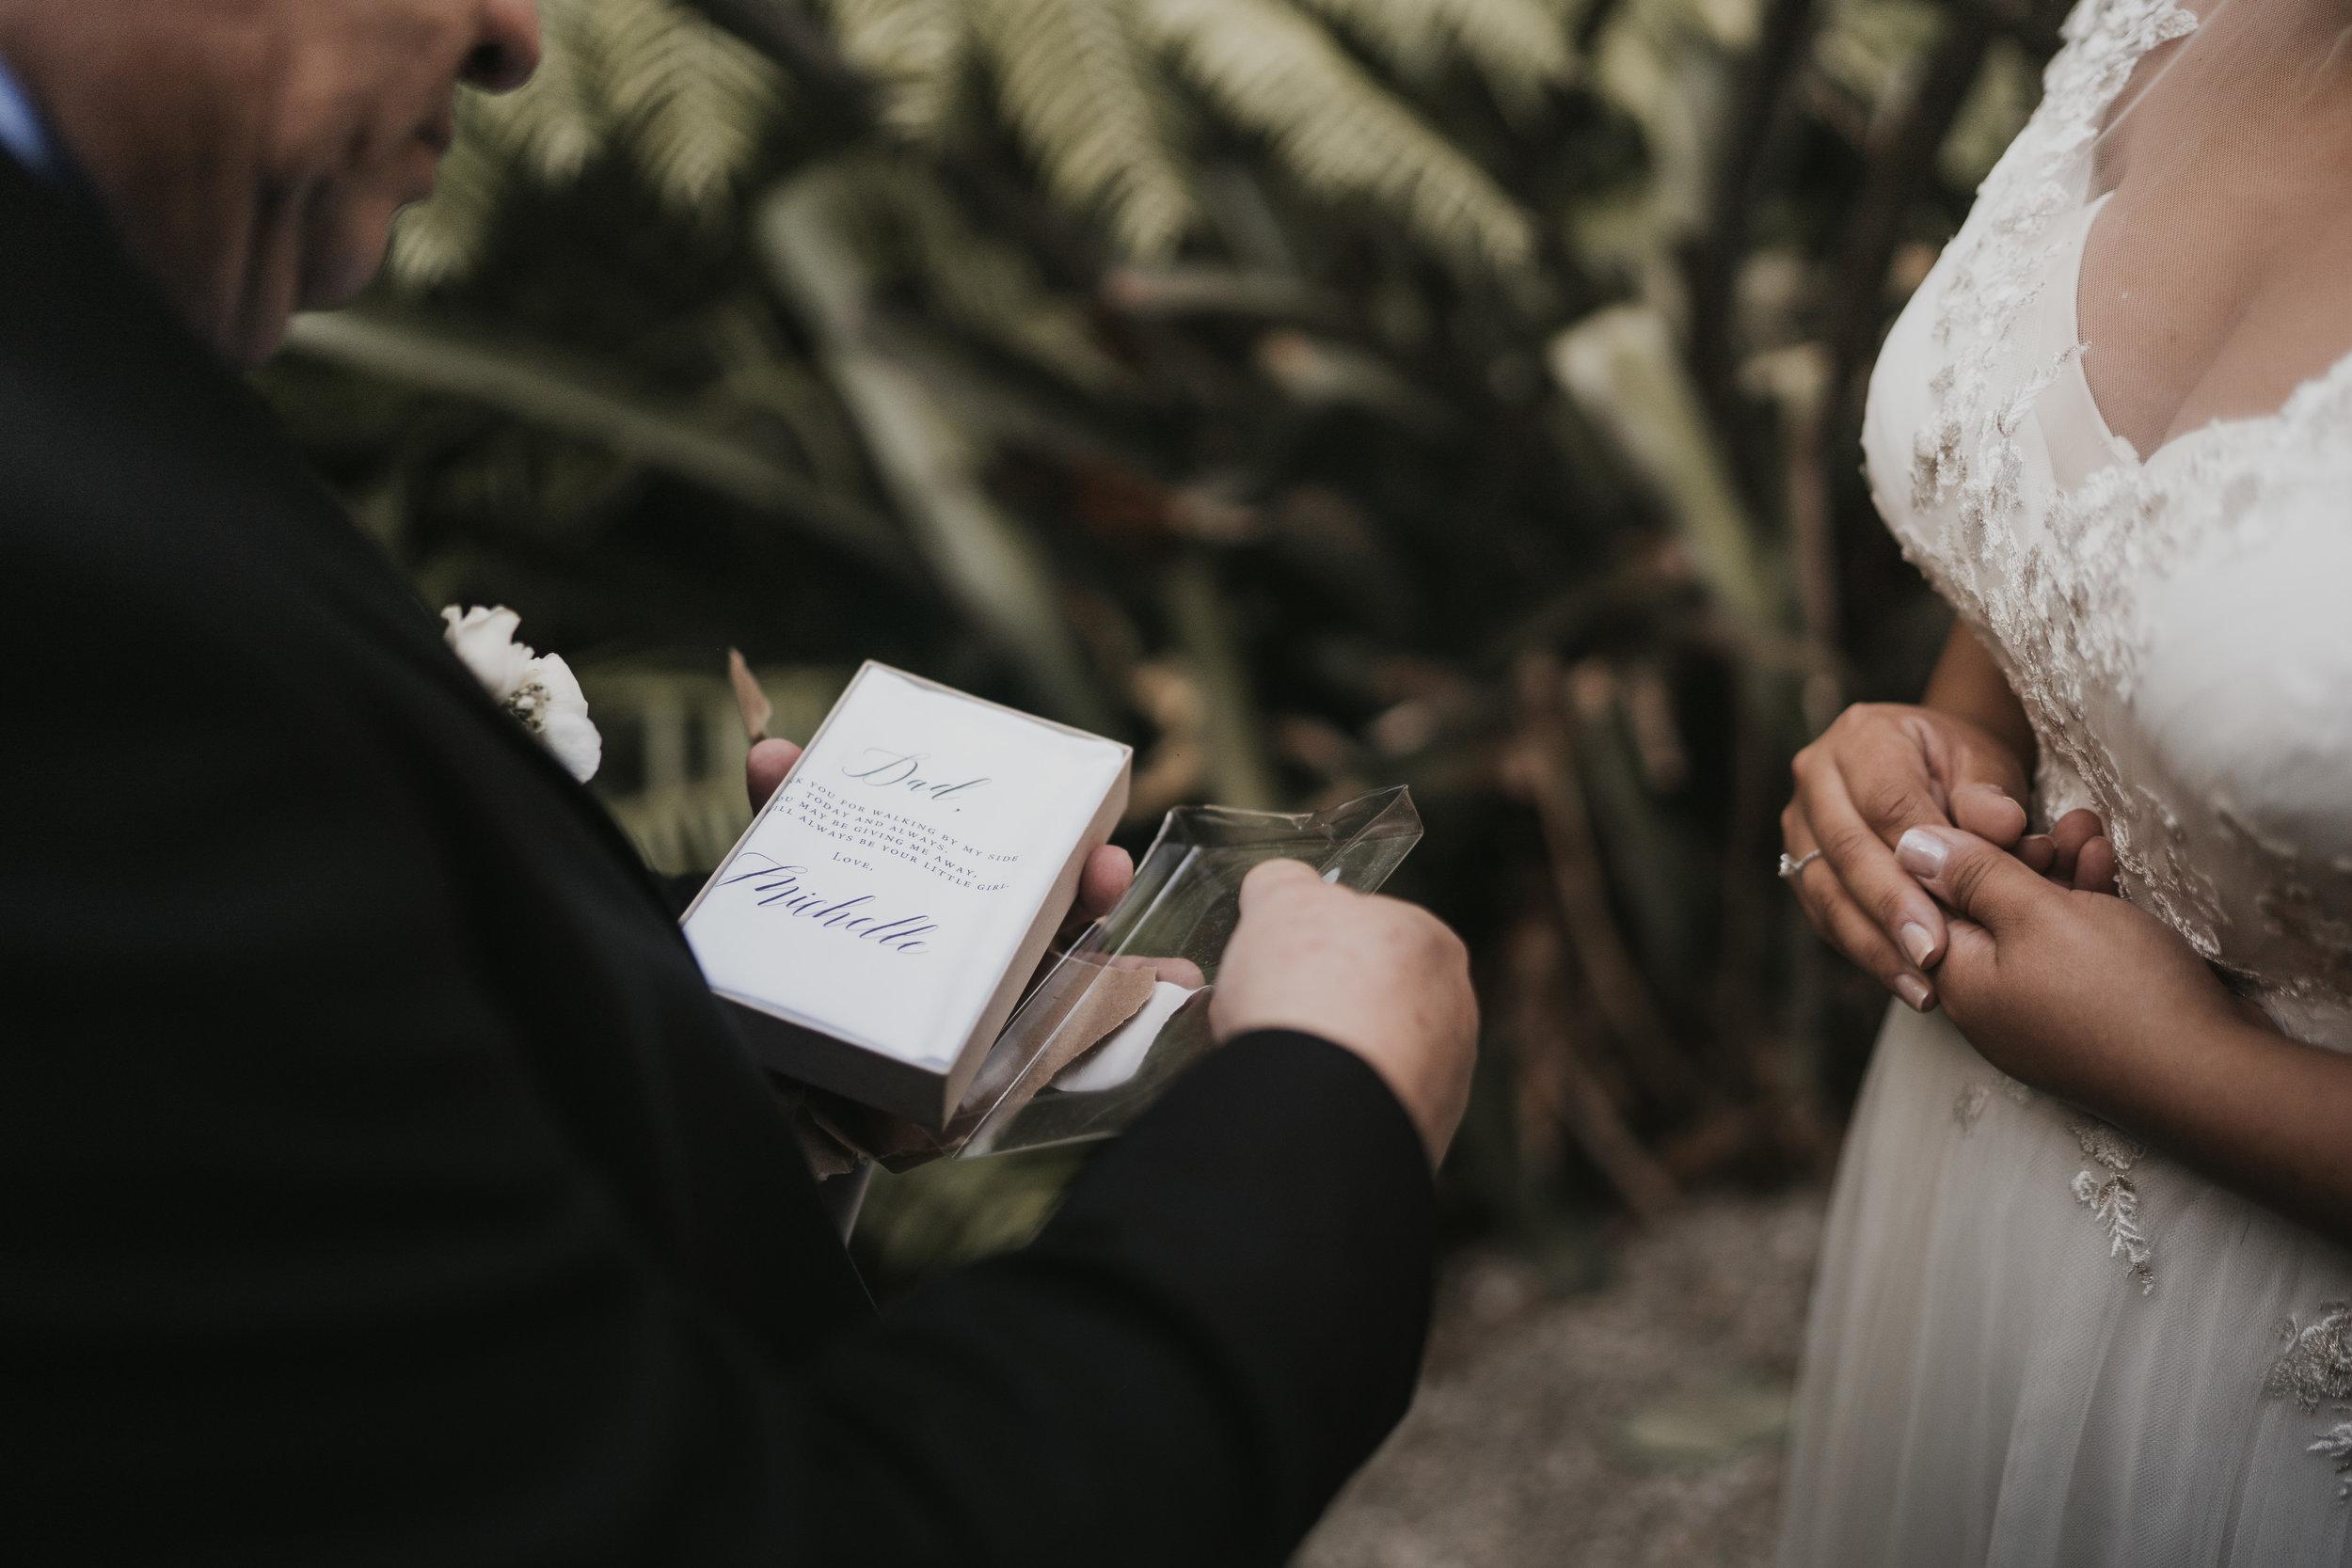 238MICHI&GABEWEDDINGDAY(WeddingFinal).jpg